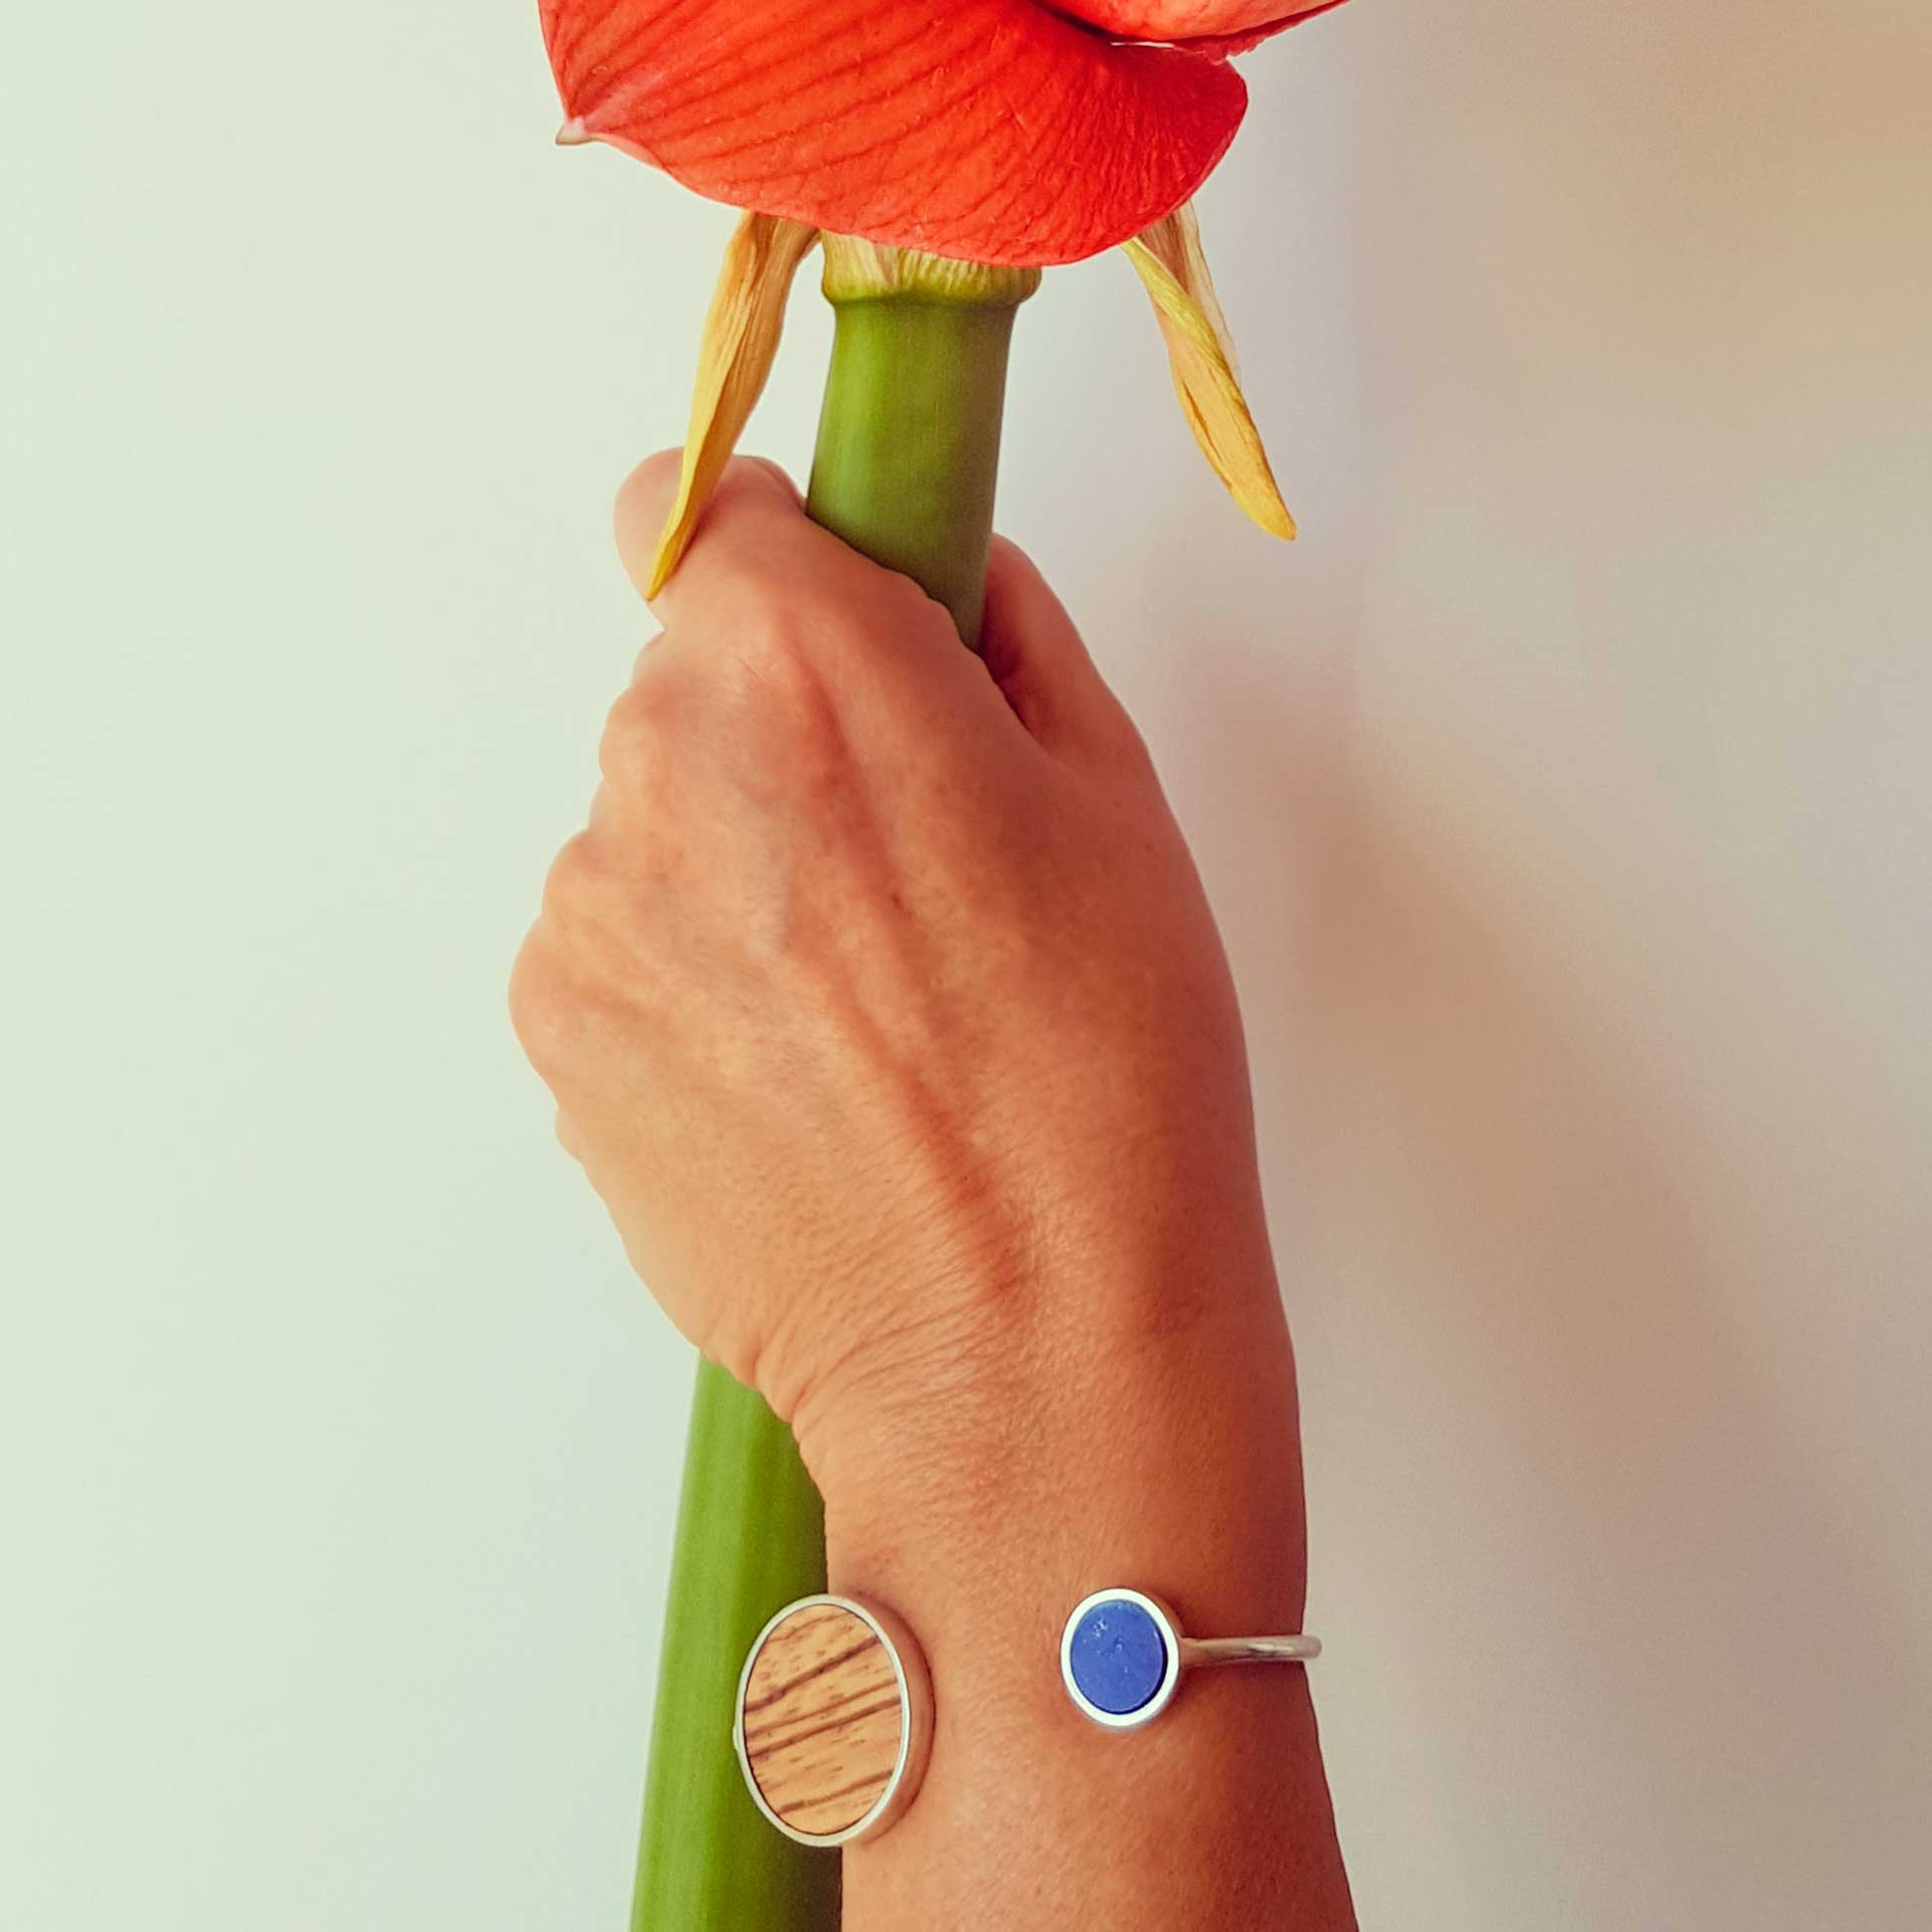 maite-arlaban-artisan-jewelry-aw2018-05